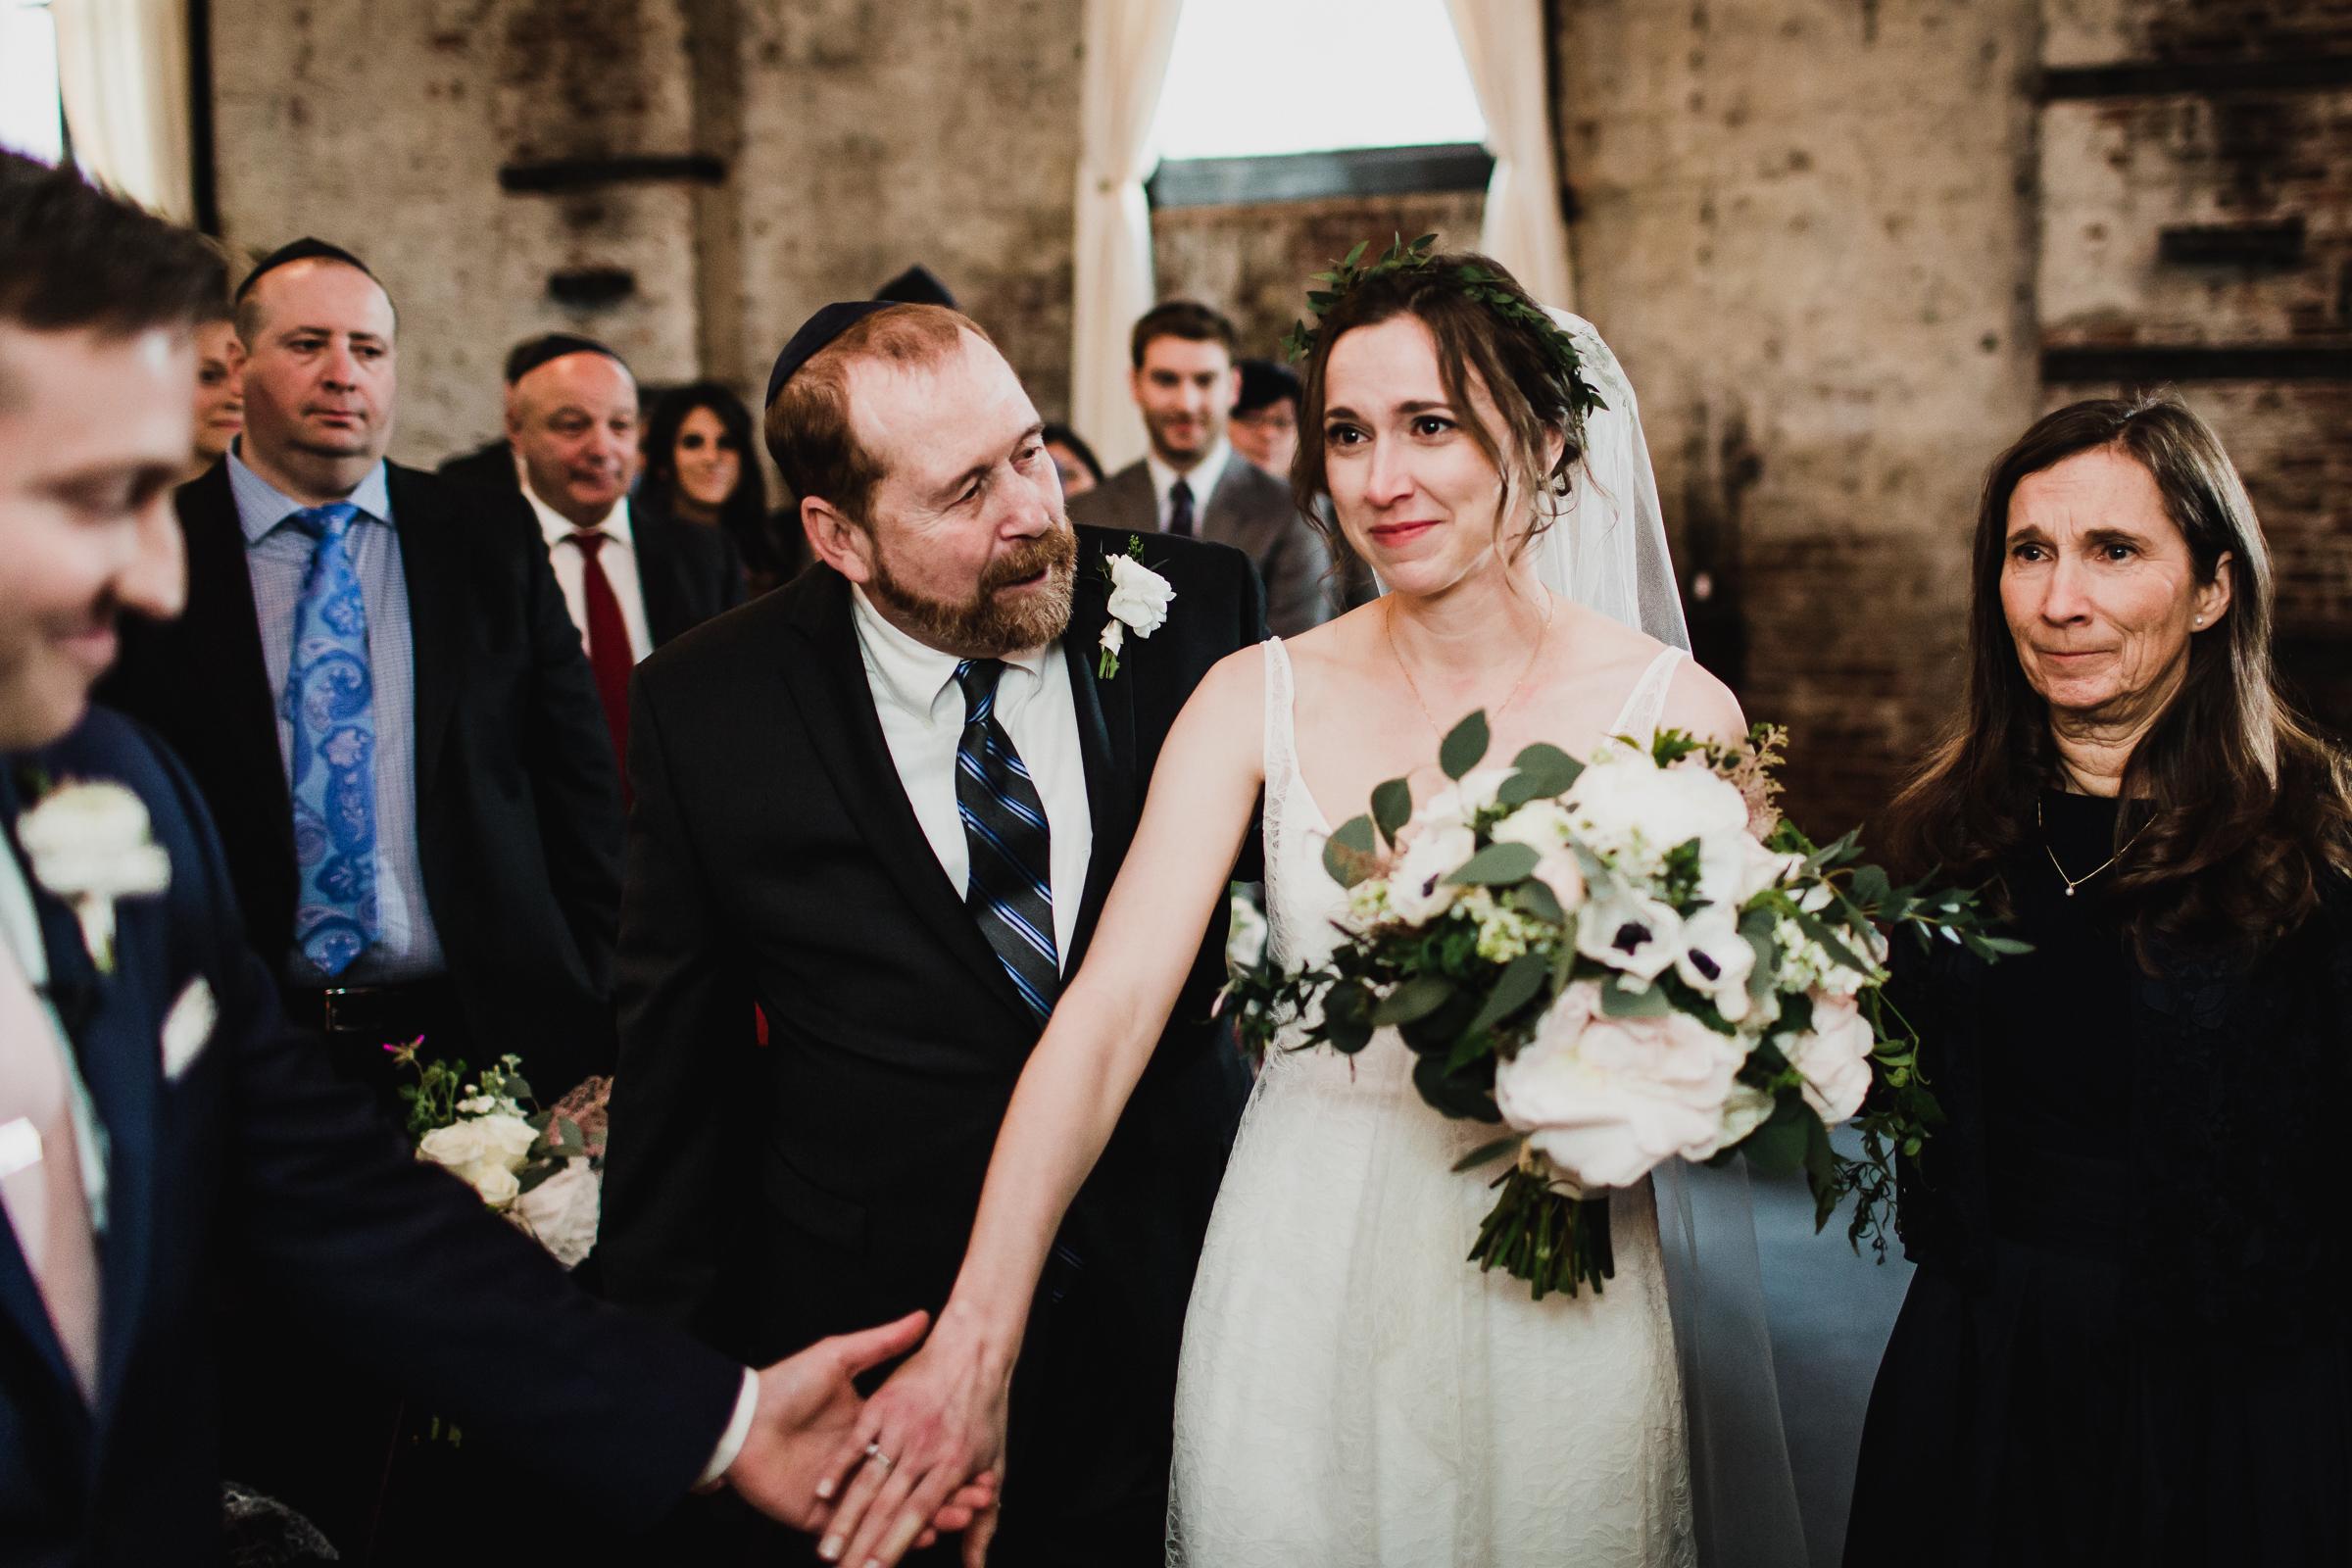 New-York-Documentary-Wedding-Photography-Best-Of-2017-by-Elvira-Kalviste-Photography-15.jpg